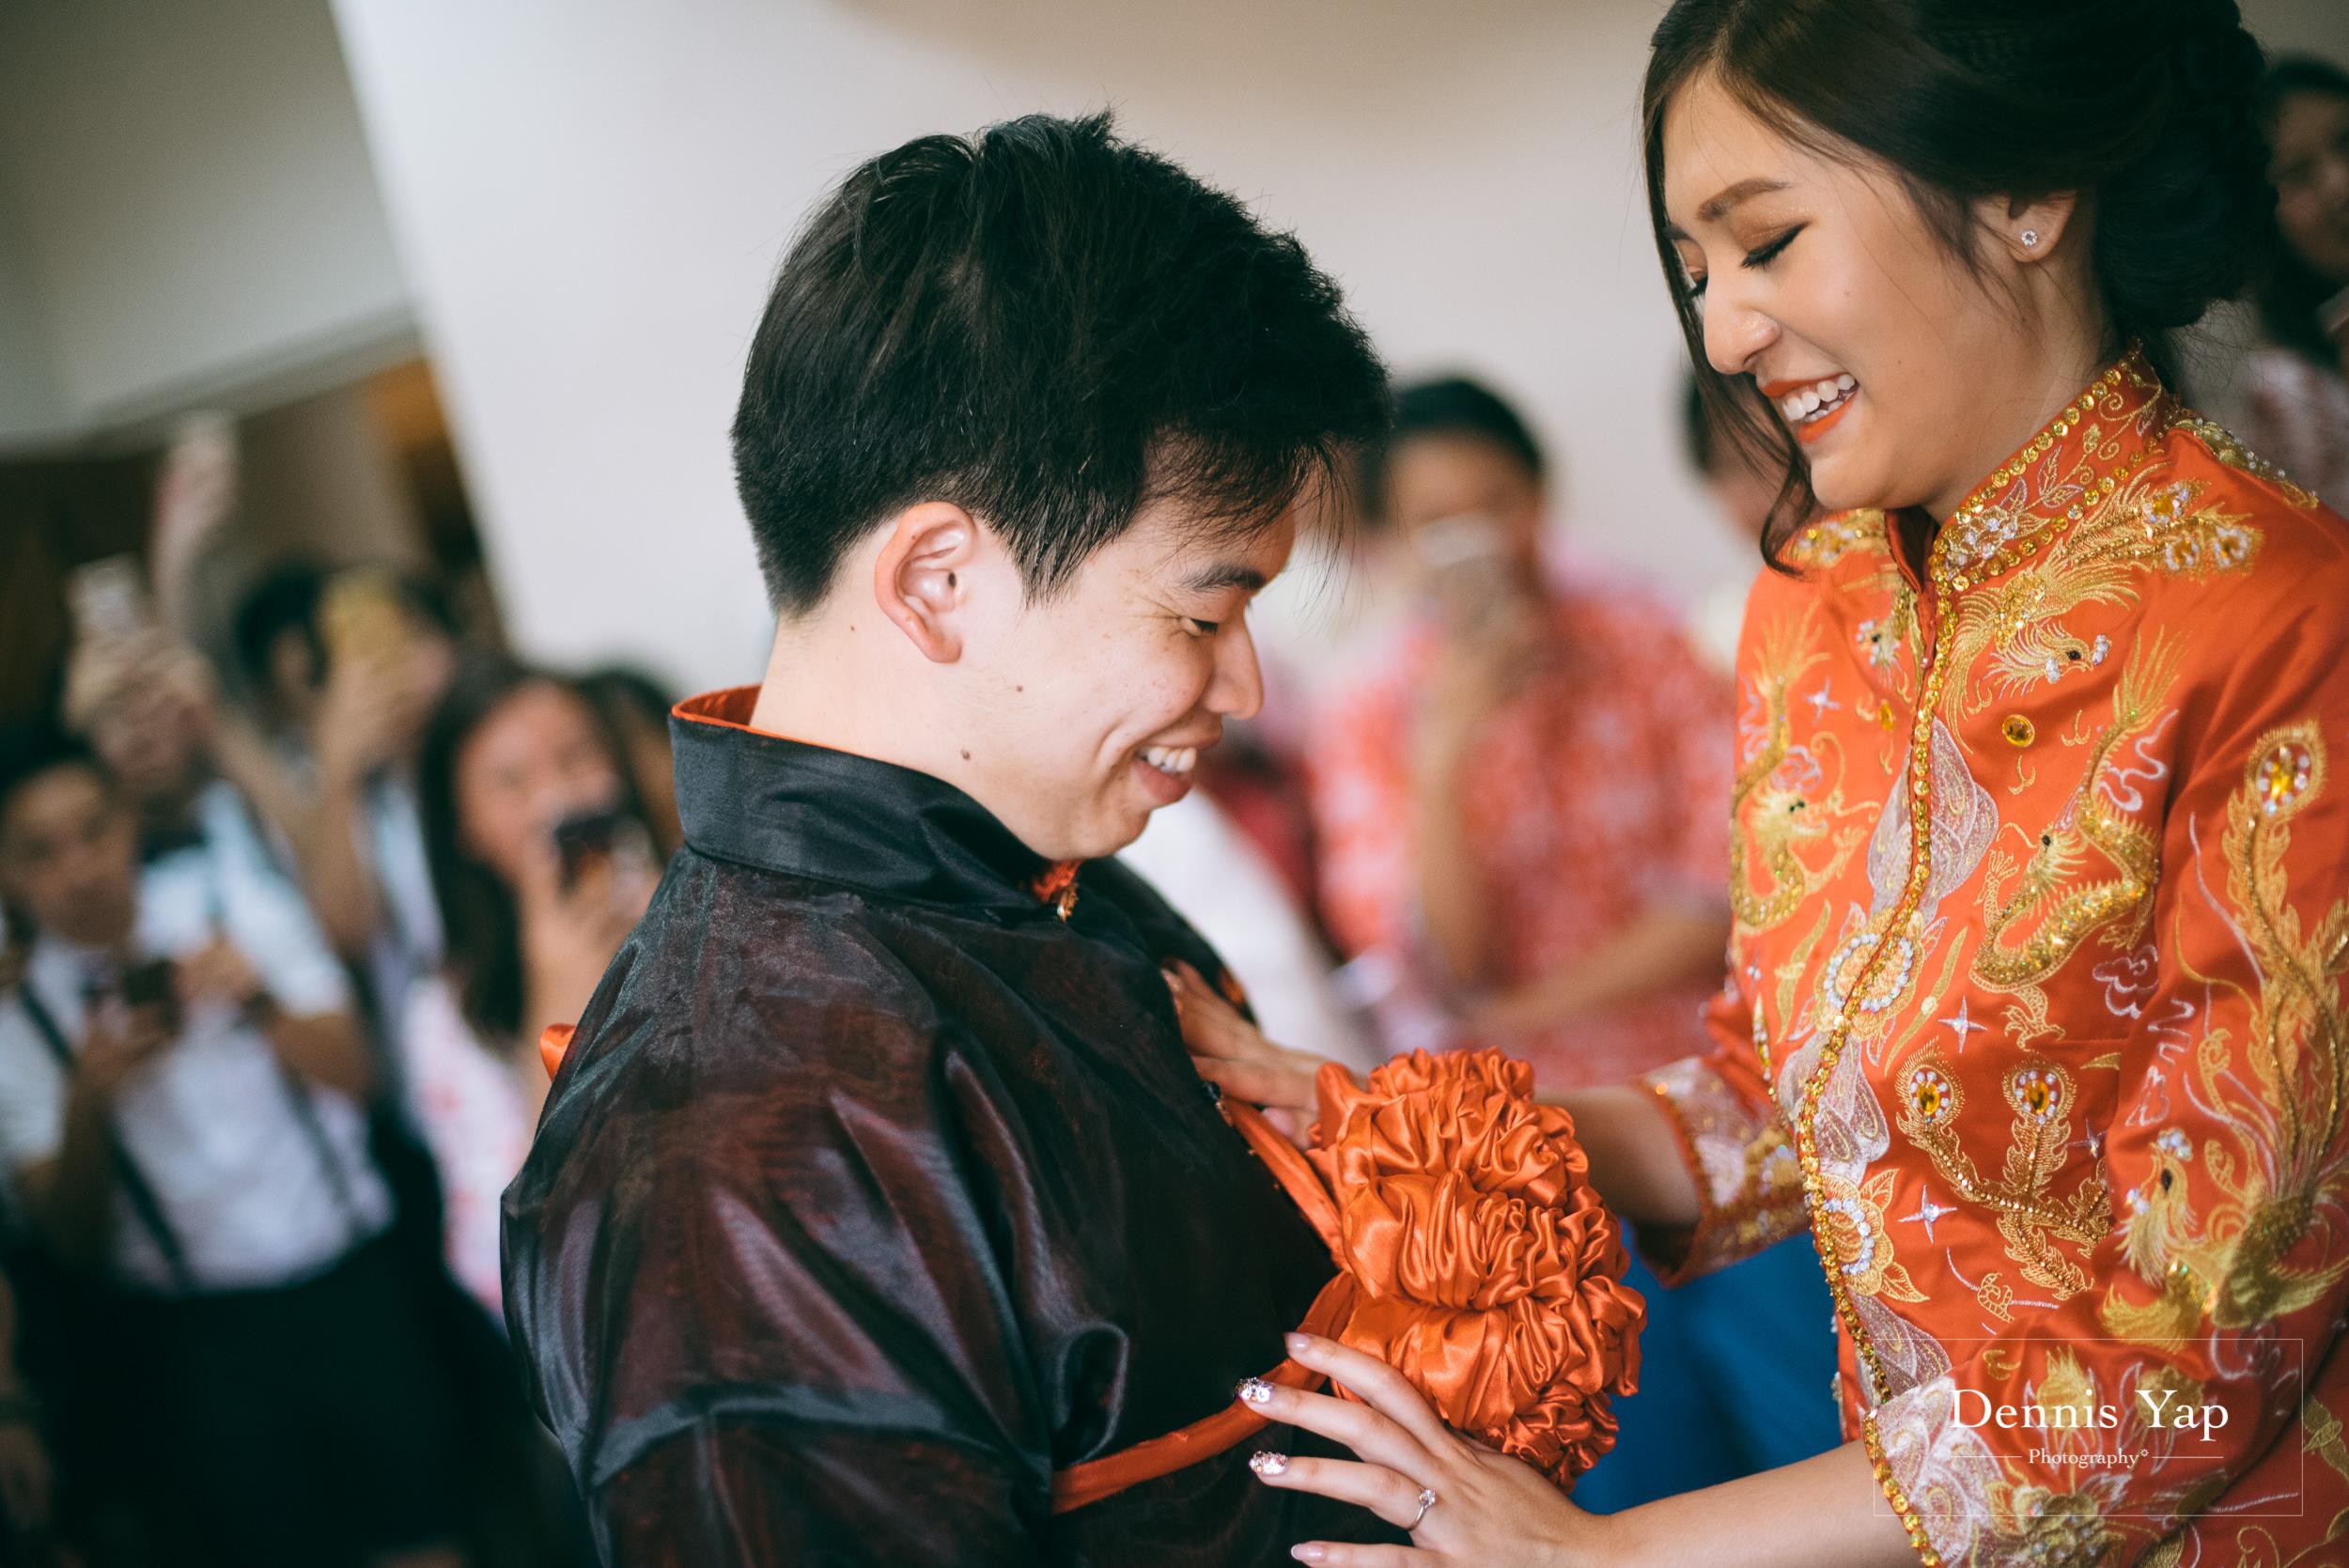 kuan rachel wedding day kuala lumpur melbourne gate crash dennis yap malaysia wedding photographer-19.jpg